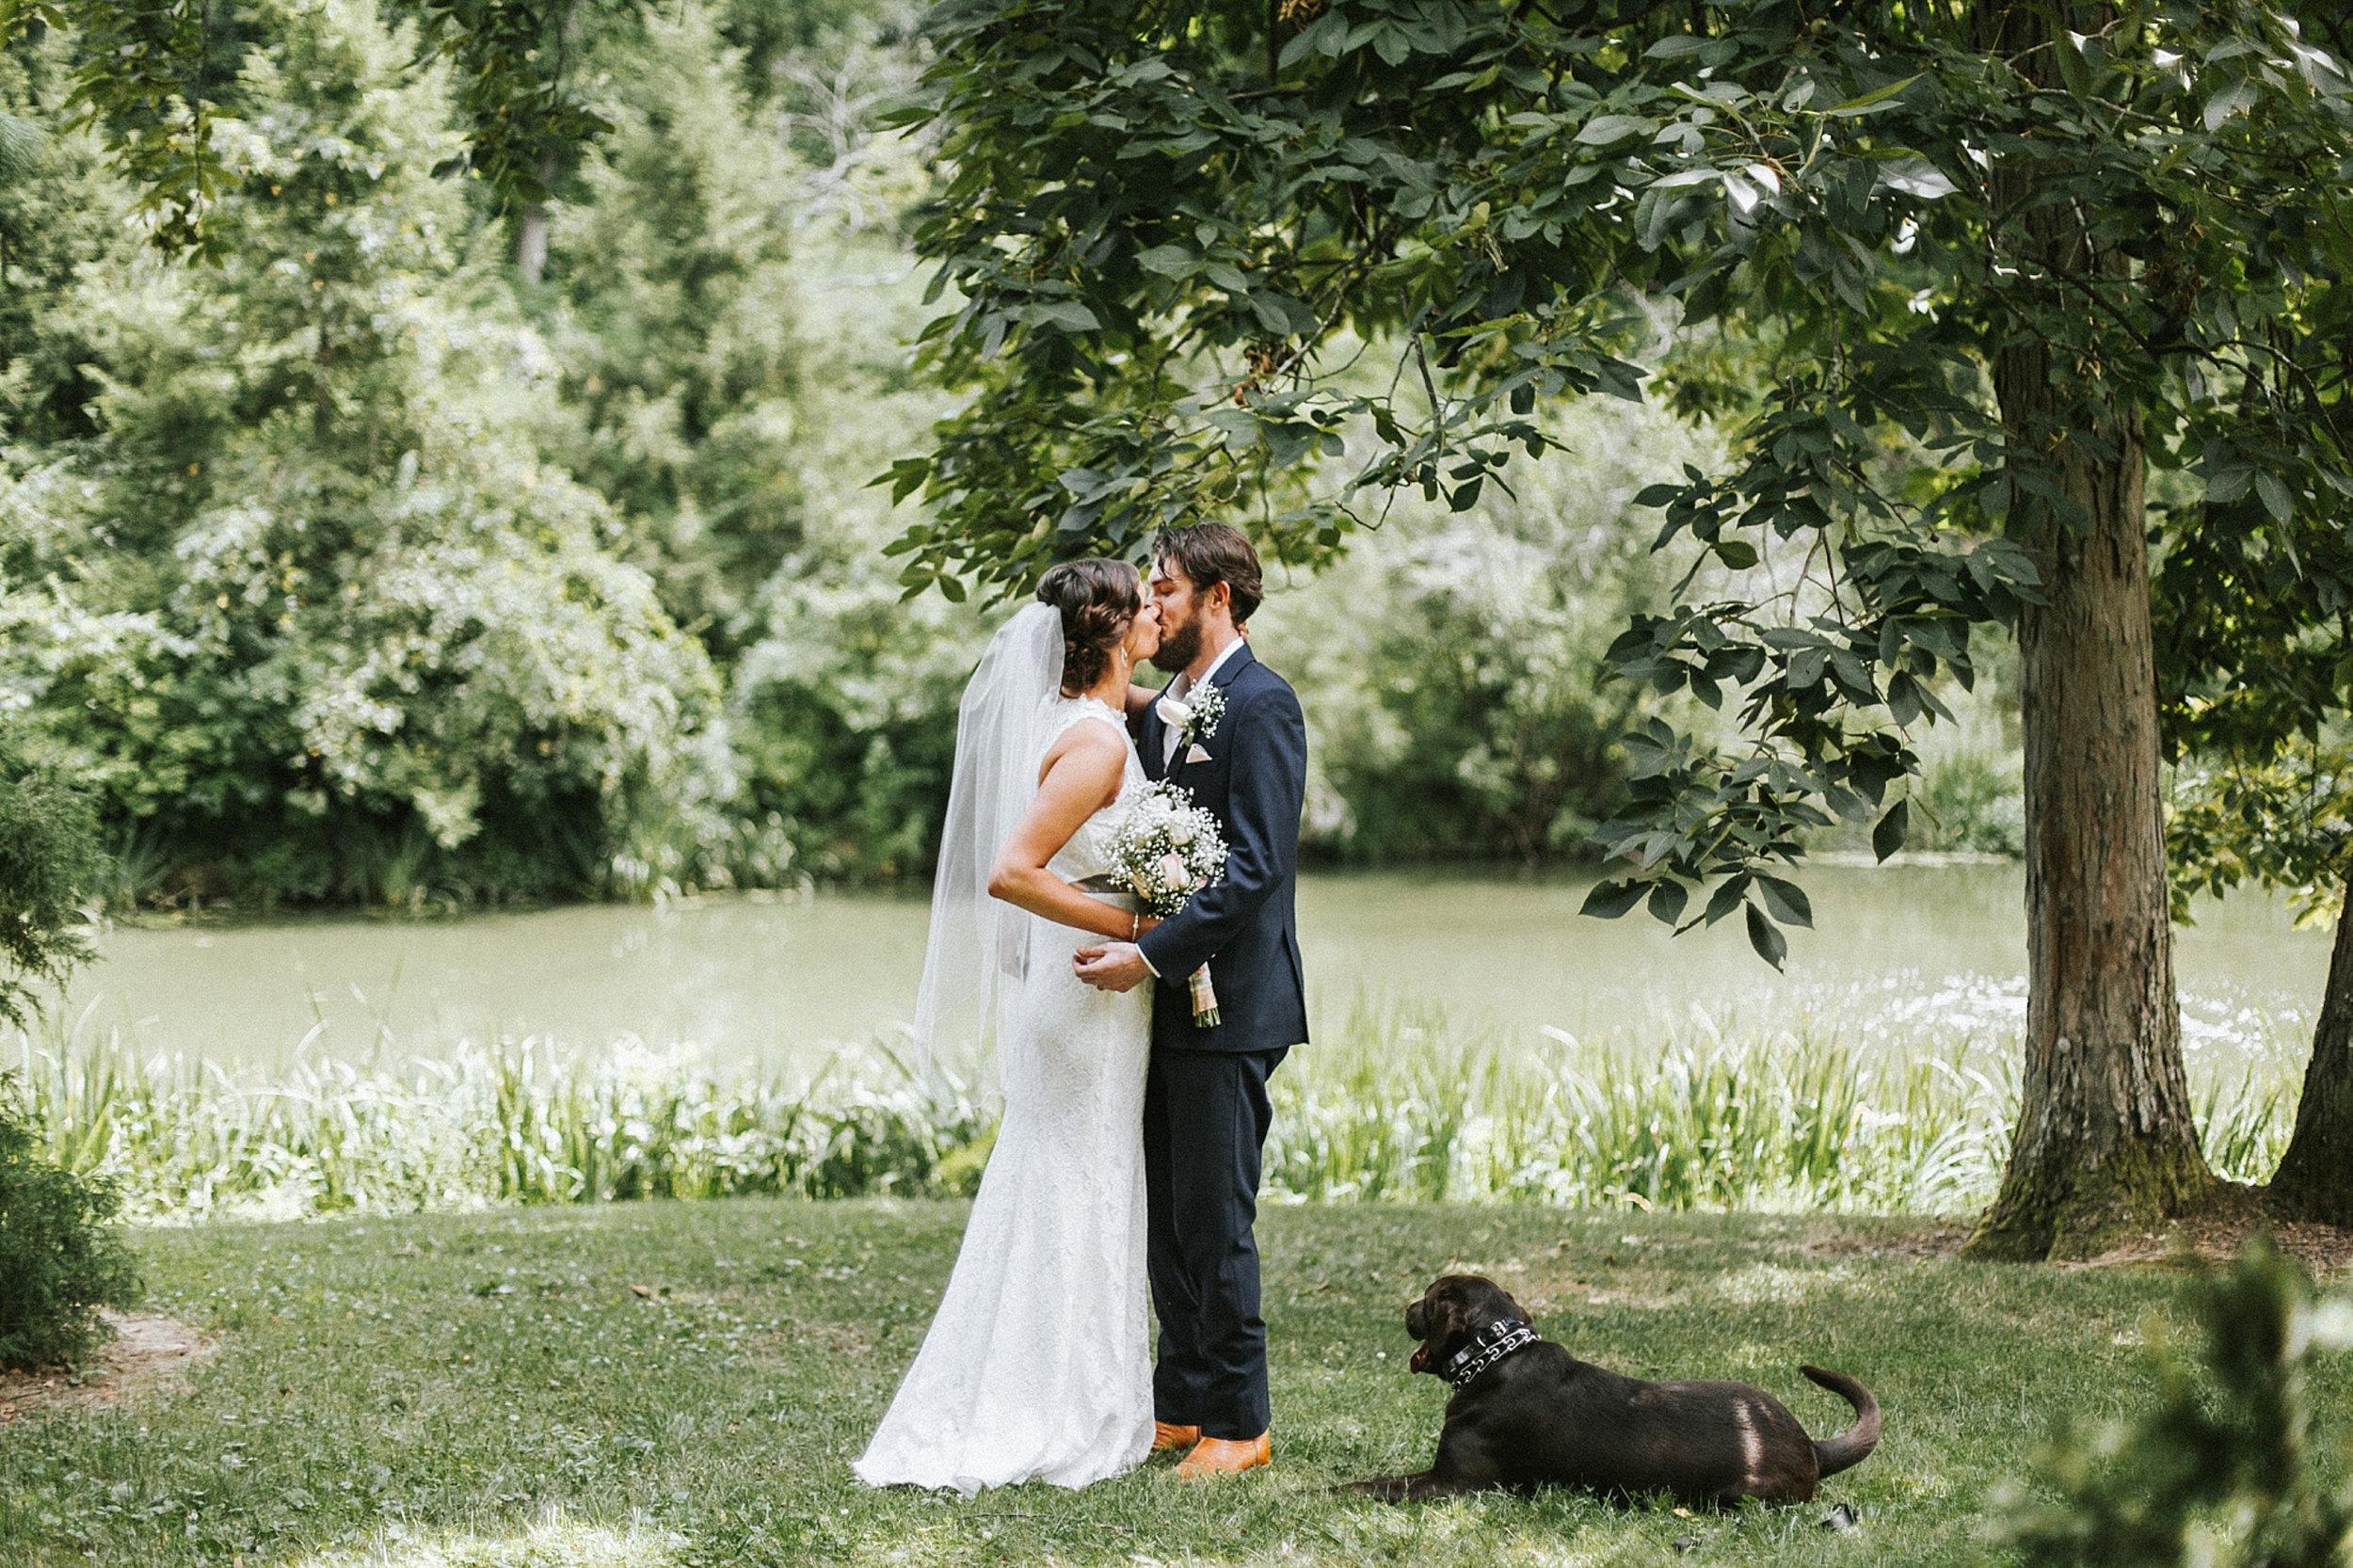 Brooke Townsend Photography - Ohio Wedding Photographer (13 of 78).jpg